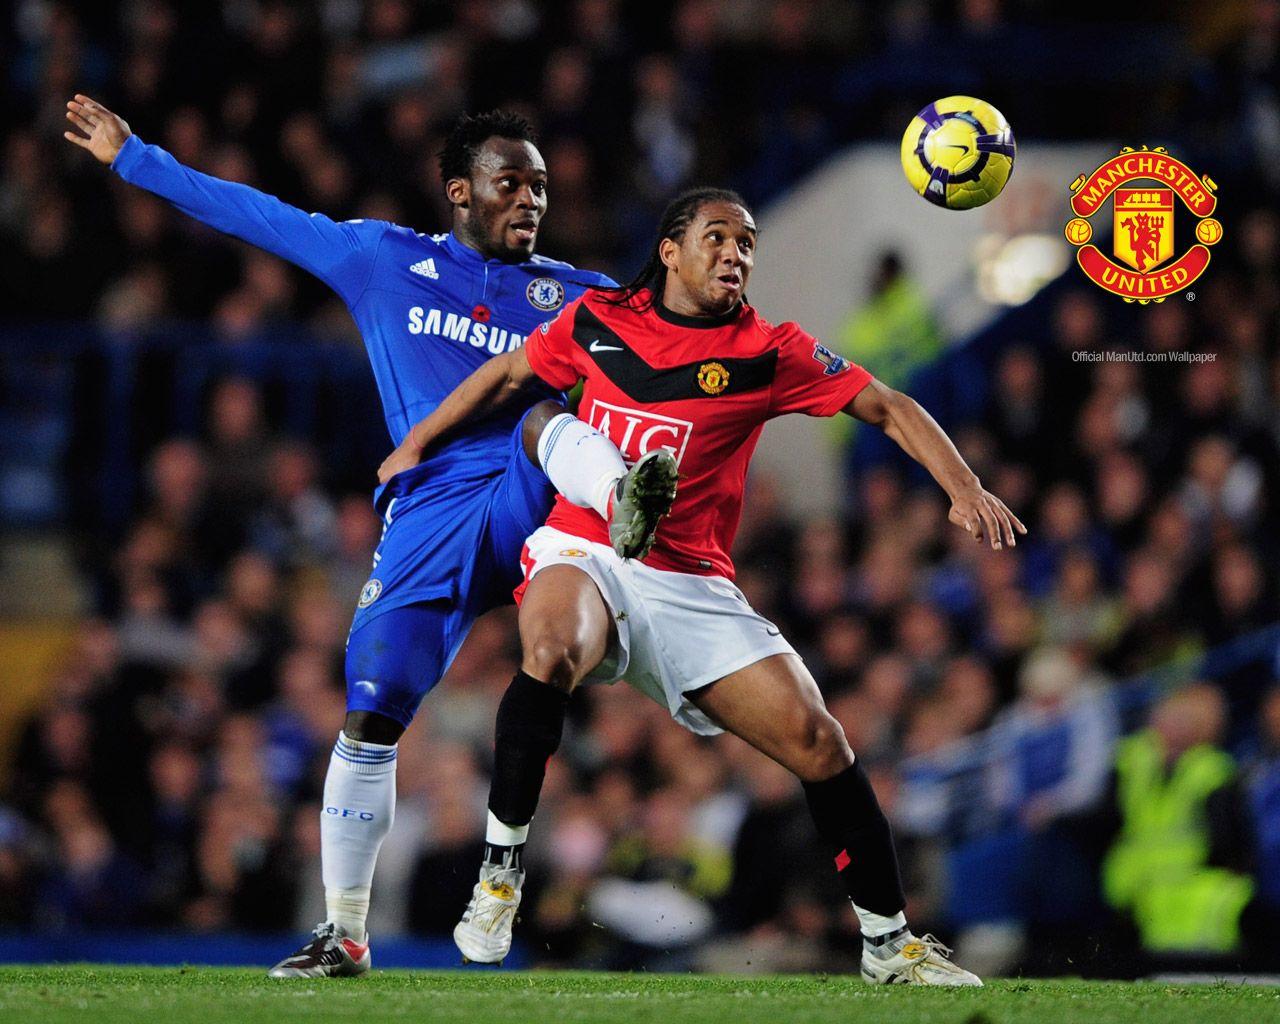 Chelsea Vs manchester united Man United | Malaysia No. 1 Fan